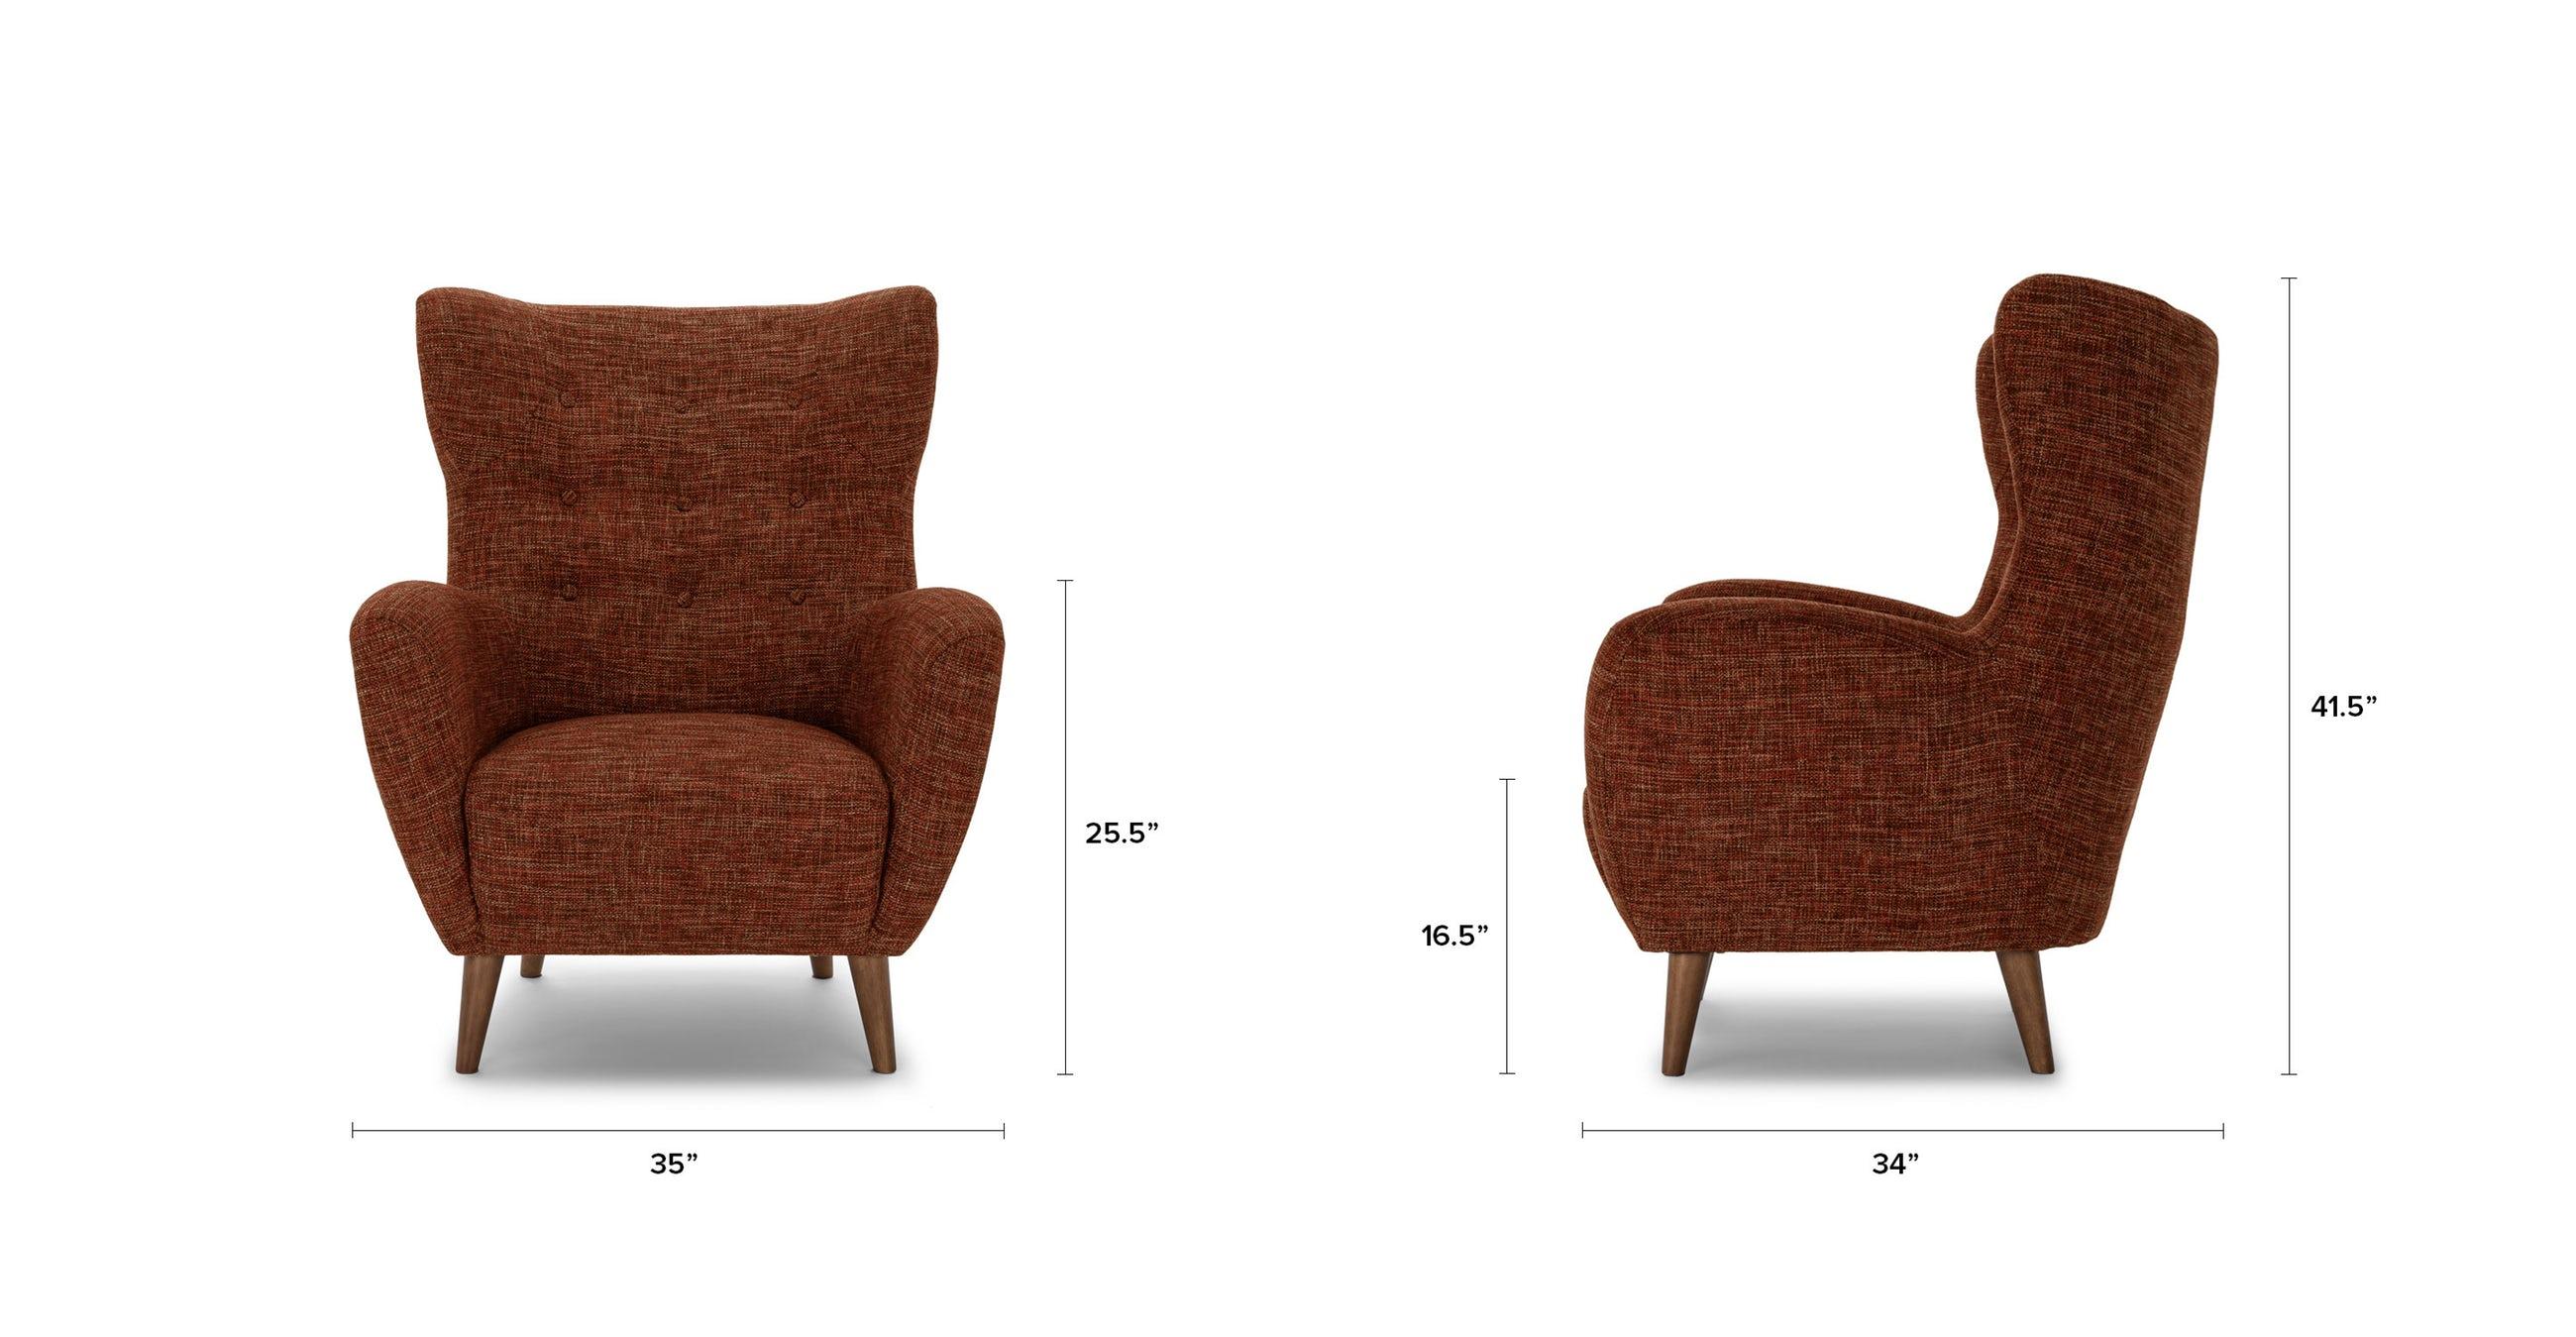 Mod Orange Spice Armchair